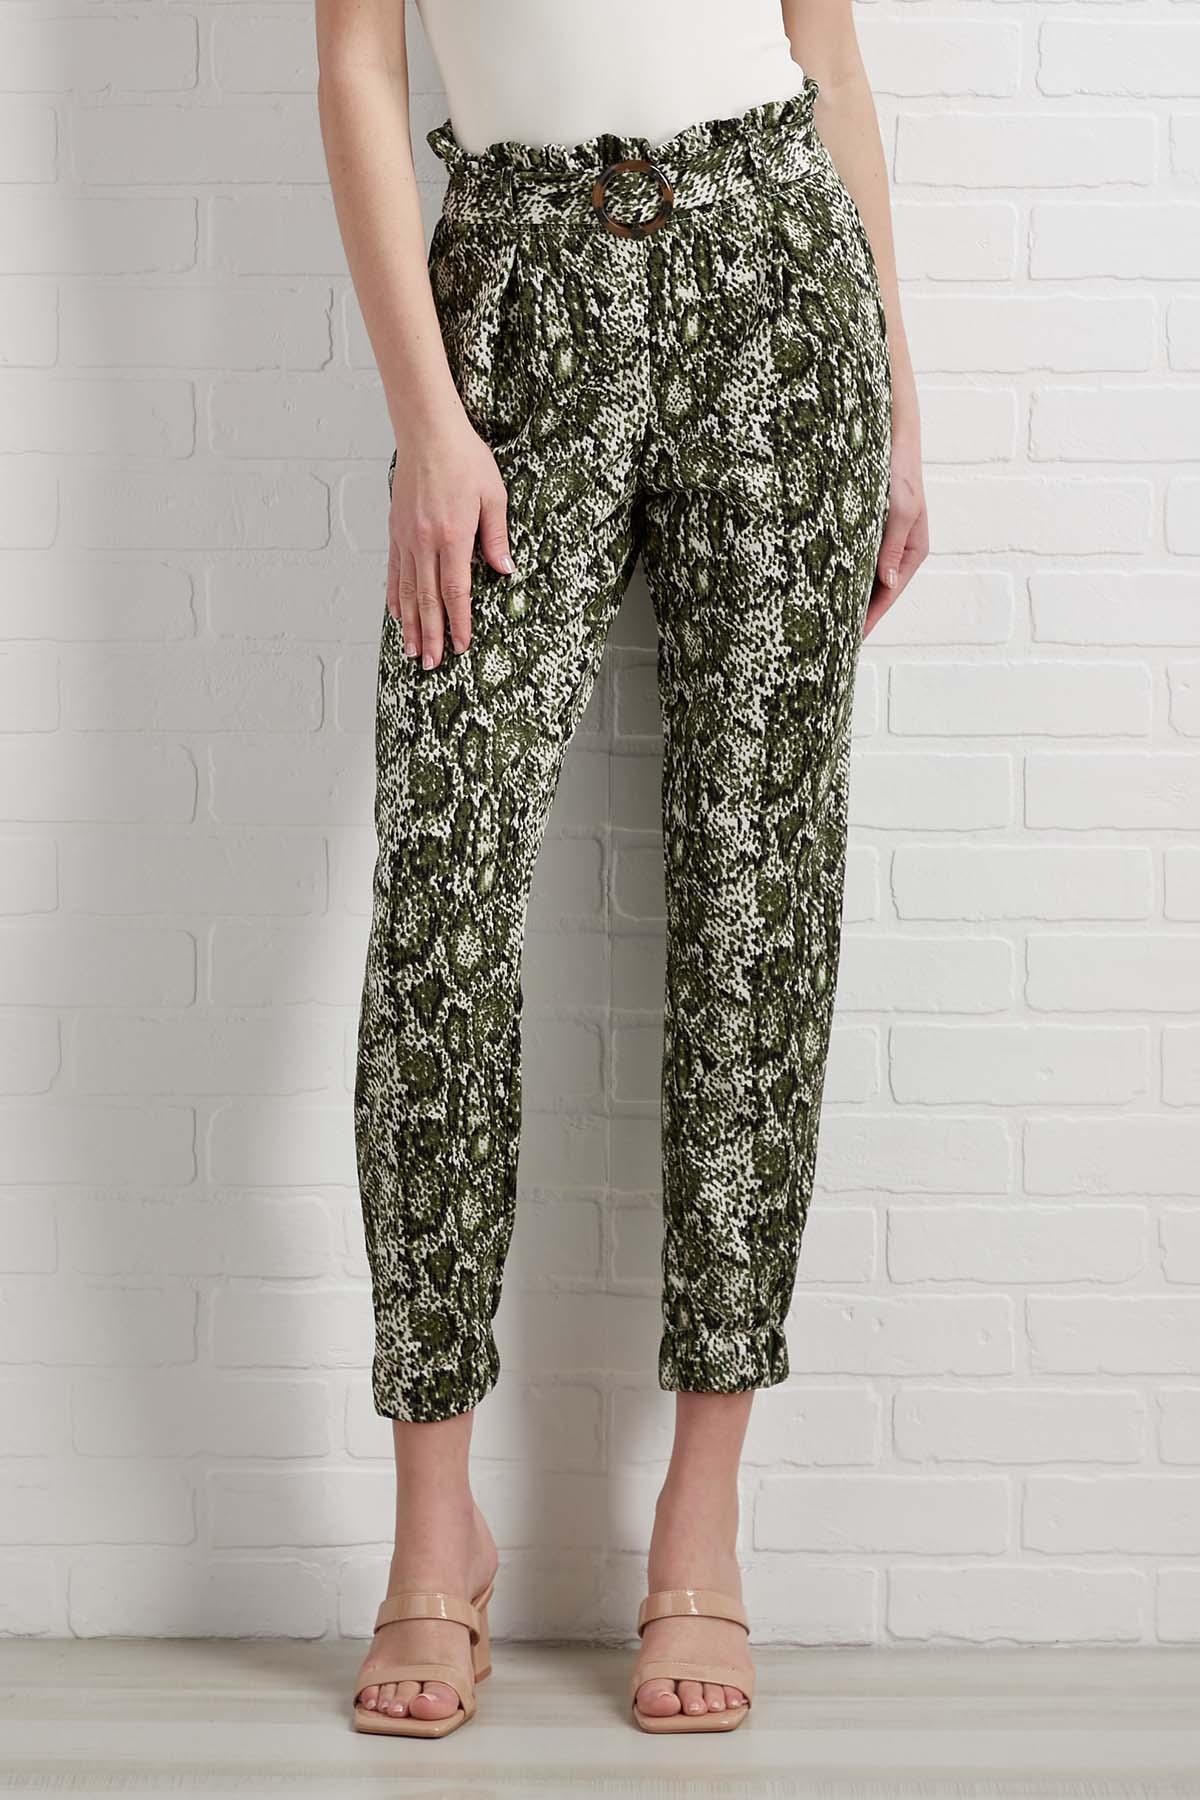 Take In The Greenery Pants